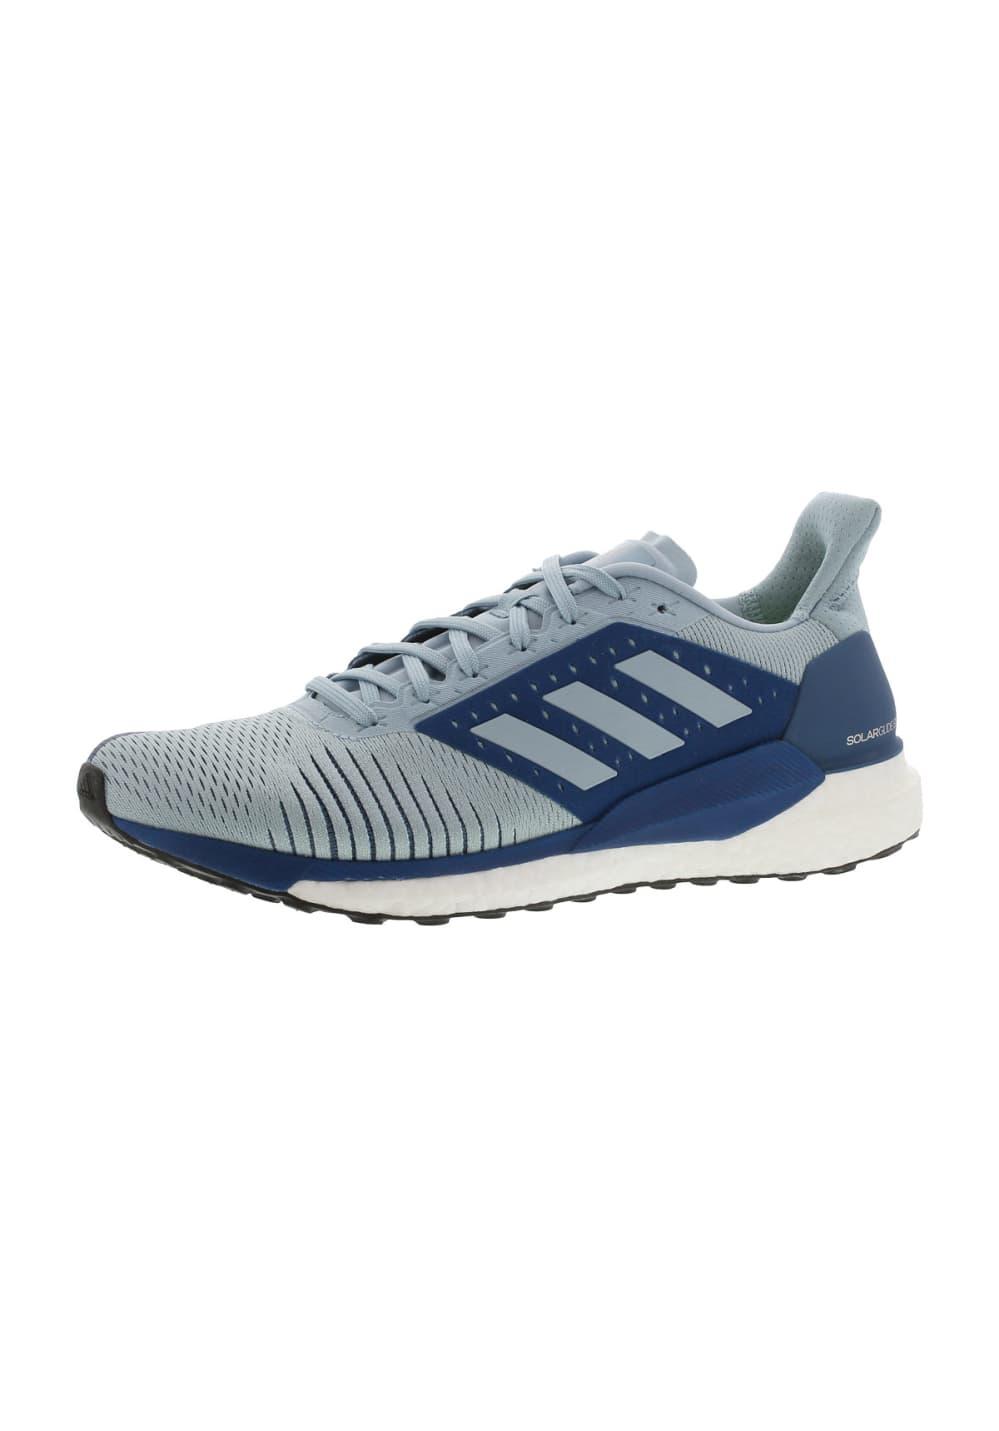 best service 3d1f3 8d9b7 adidas Solar Glide St - Running shoes for Men - Blue